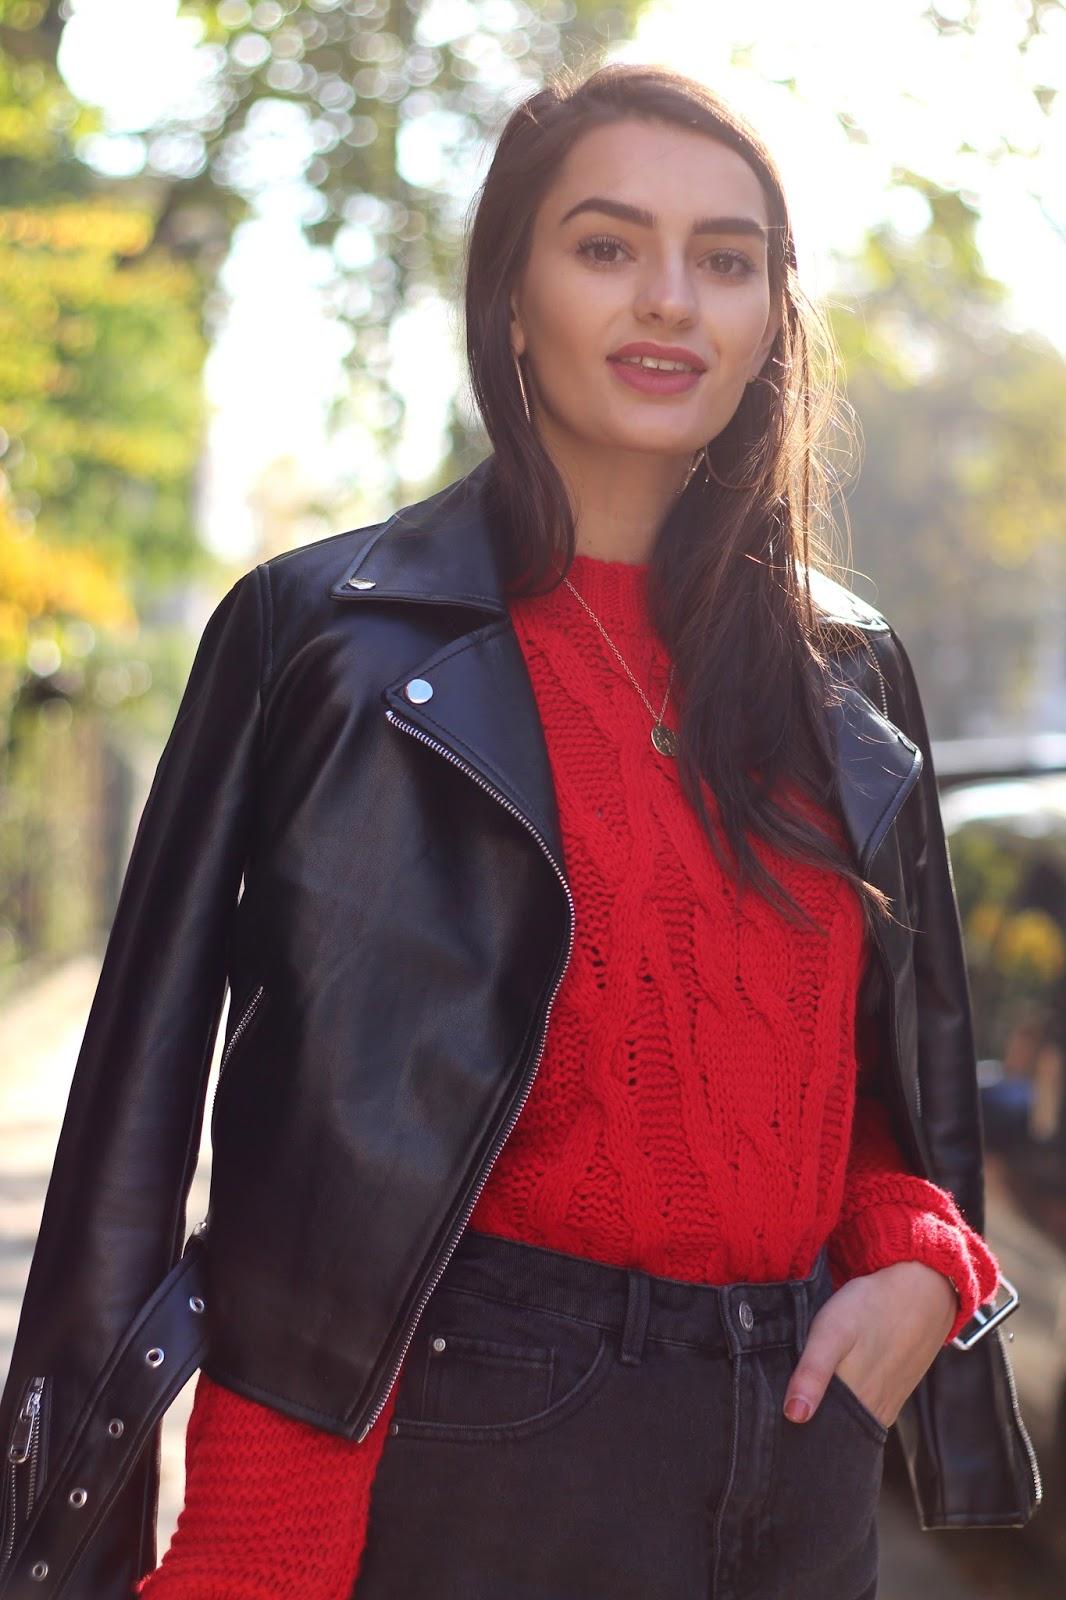 peexo fashion personal style blogger